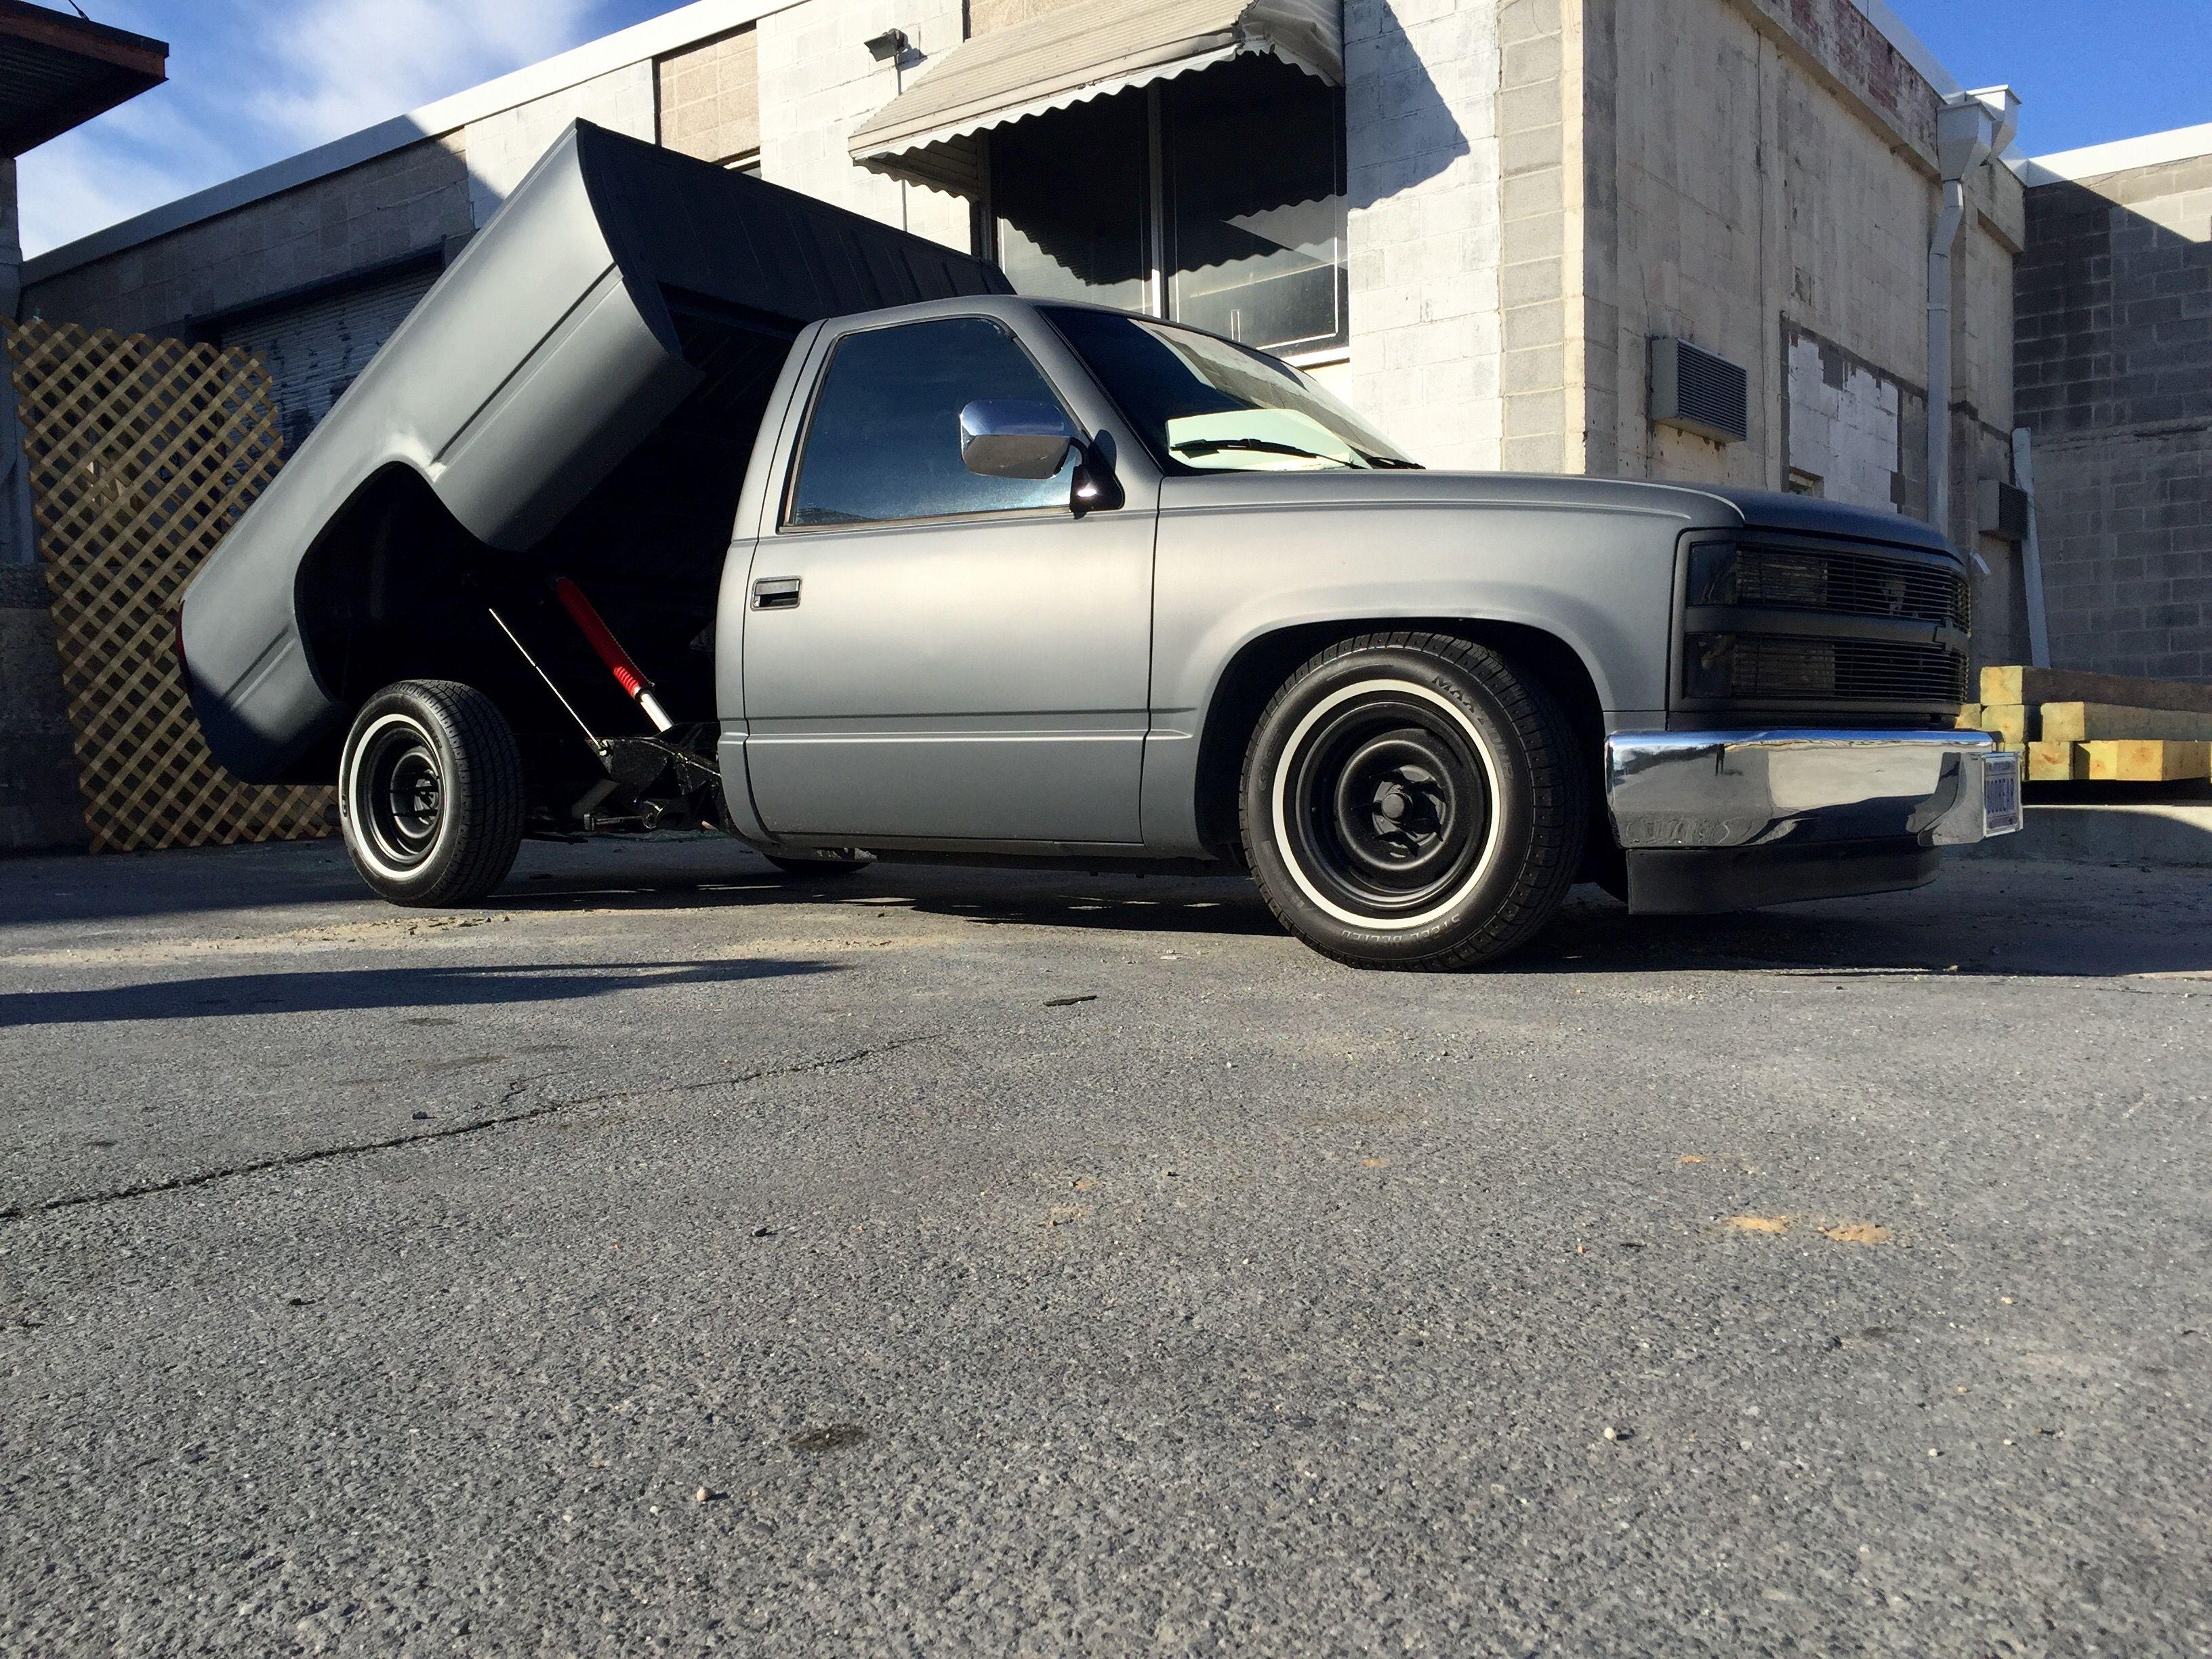 Full Body Plasti Dip Gunmetal Grey 1992 C1500 1992 Chevy C1500